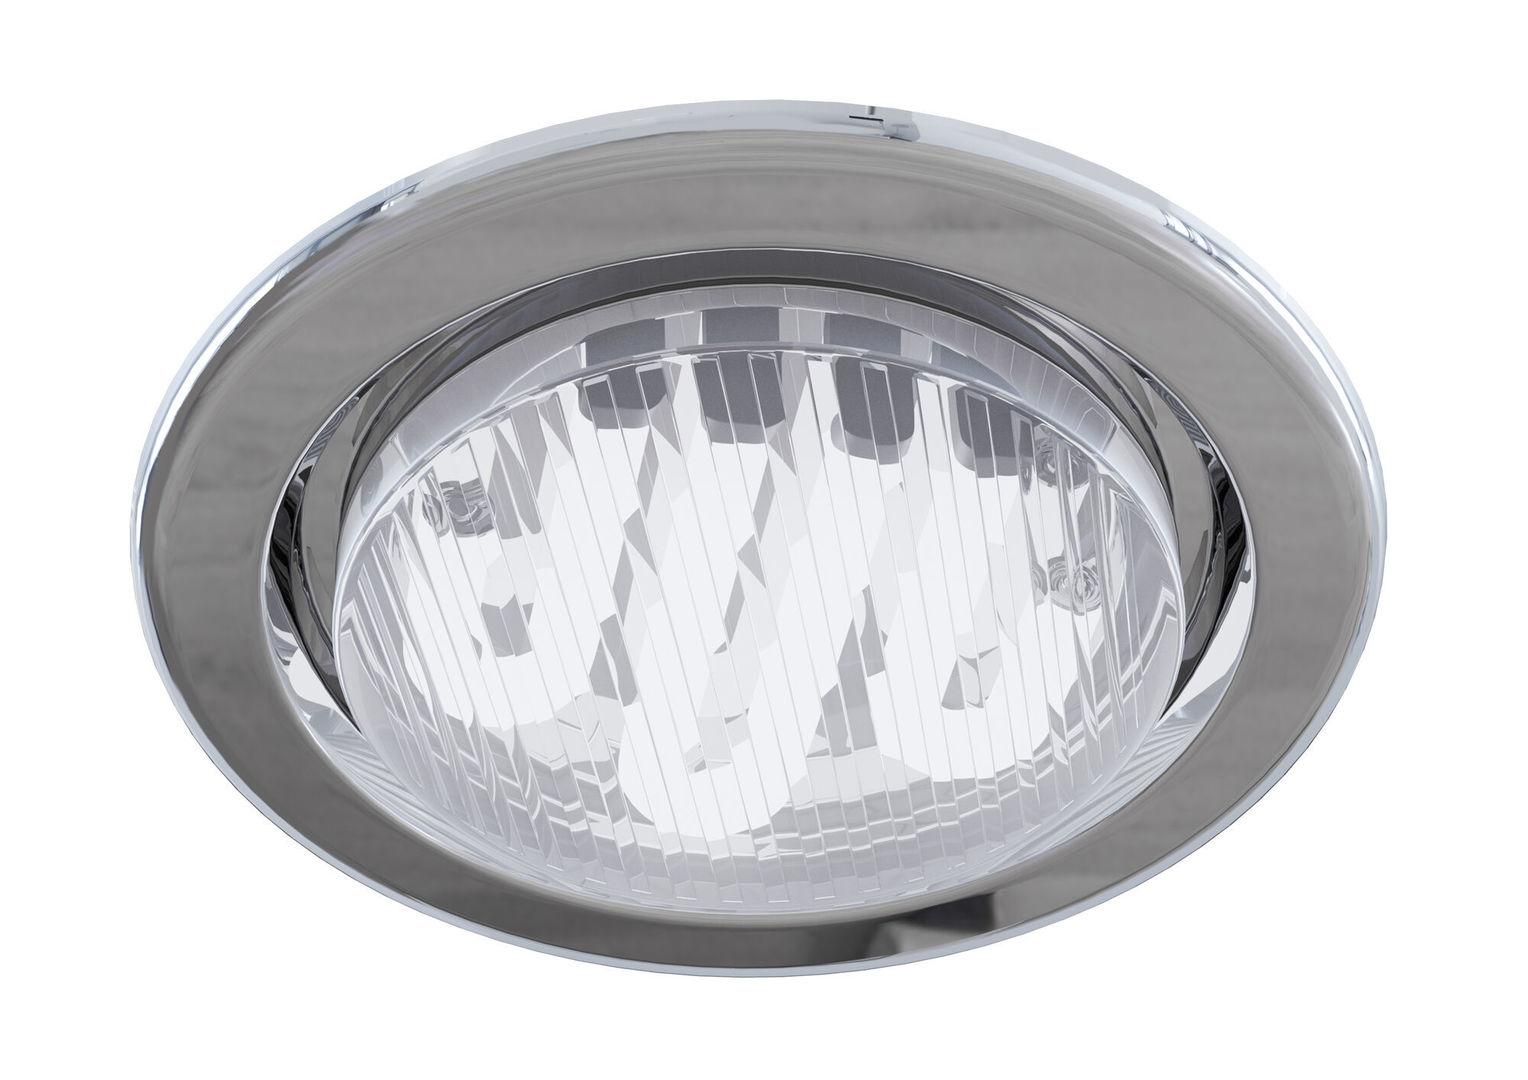 Corp de iluminat încorporat Maytoni Metal Modern DL293-01-CH